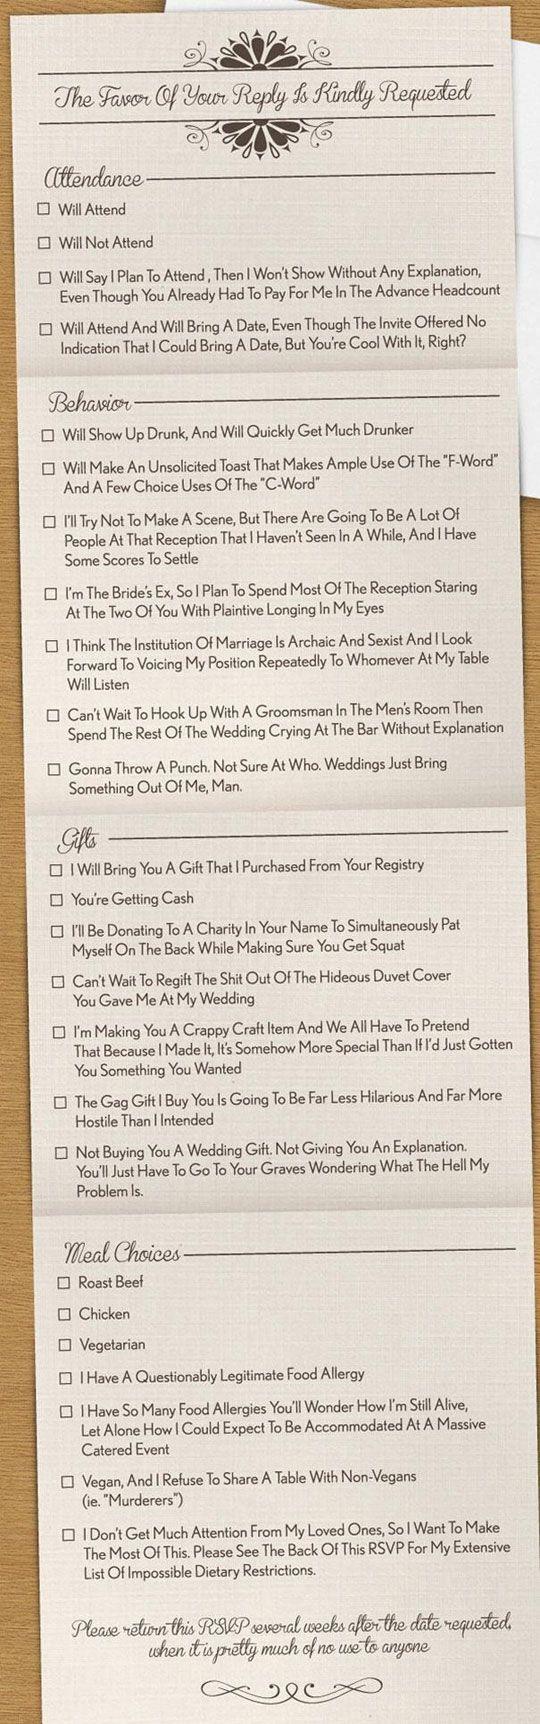 best wedding stuff images on pinterest wedding ideas bridal